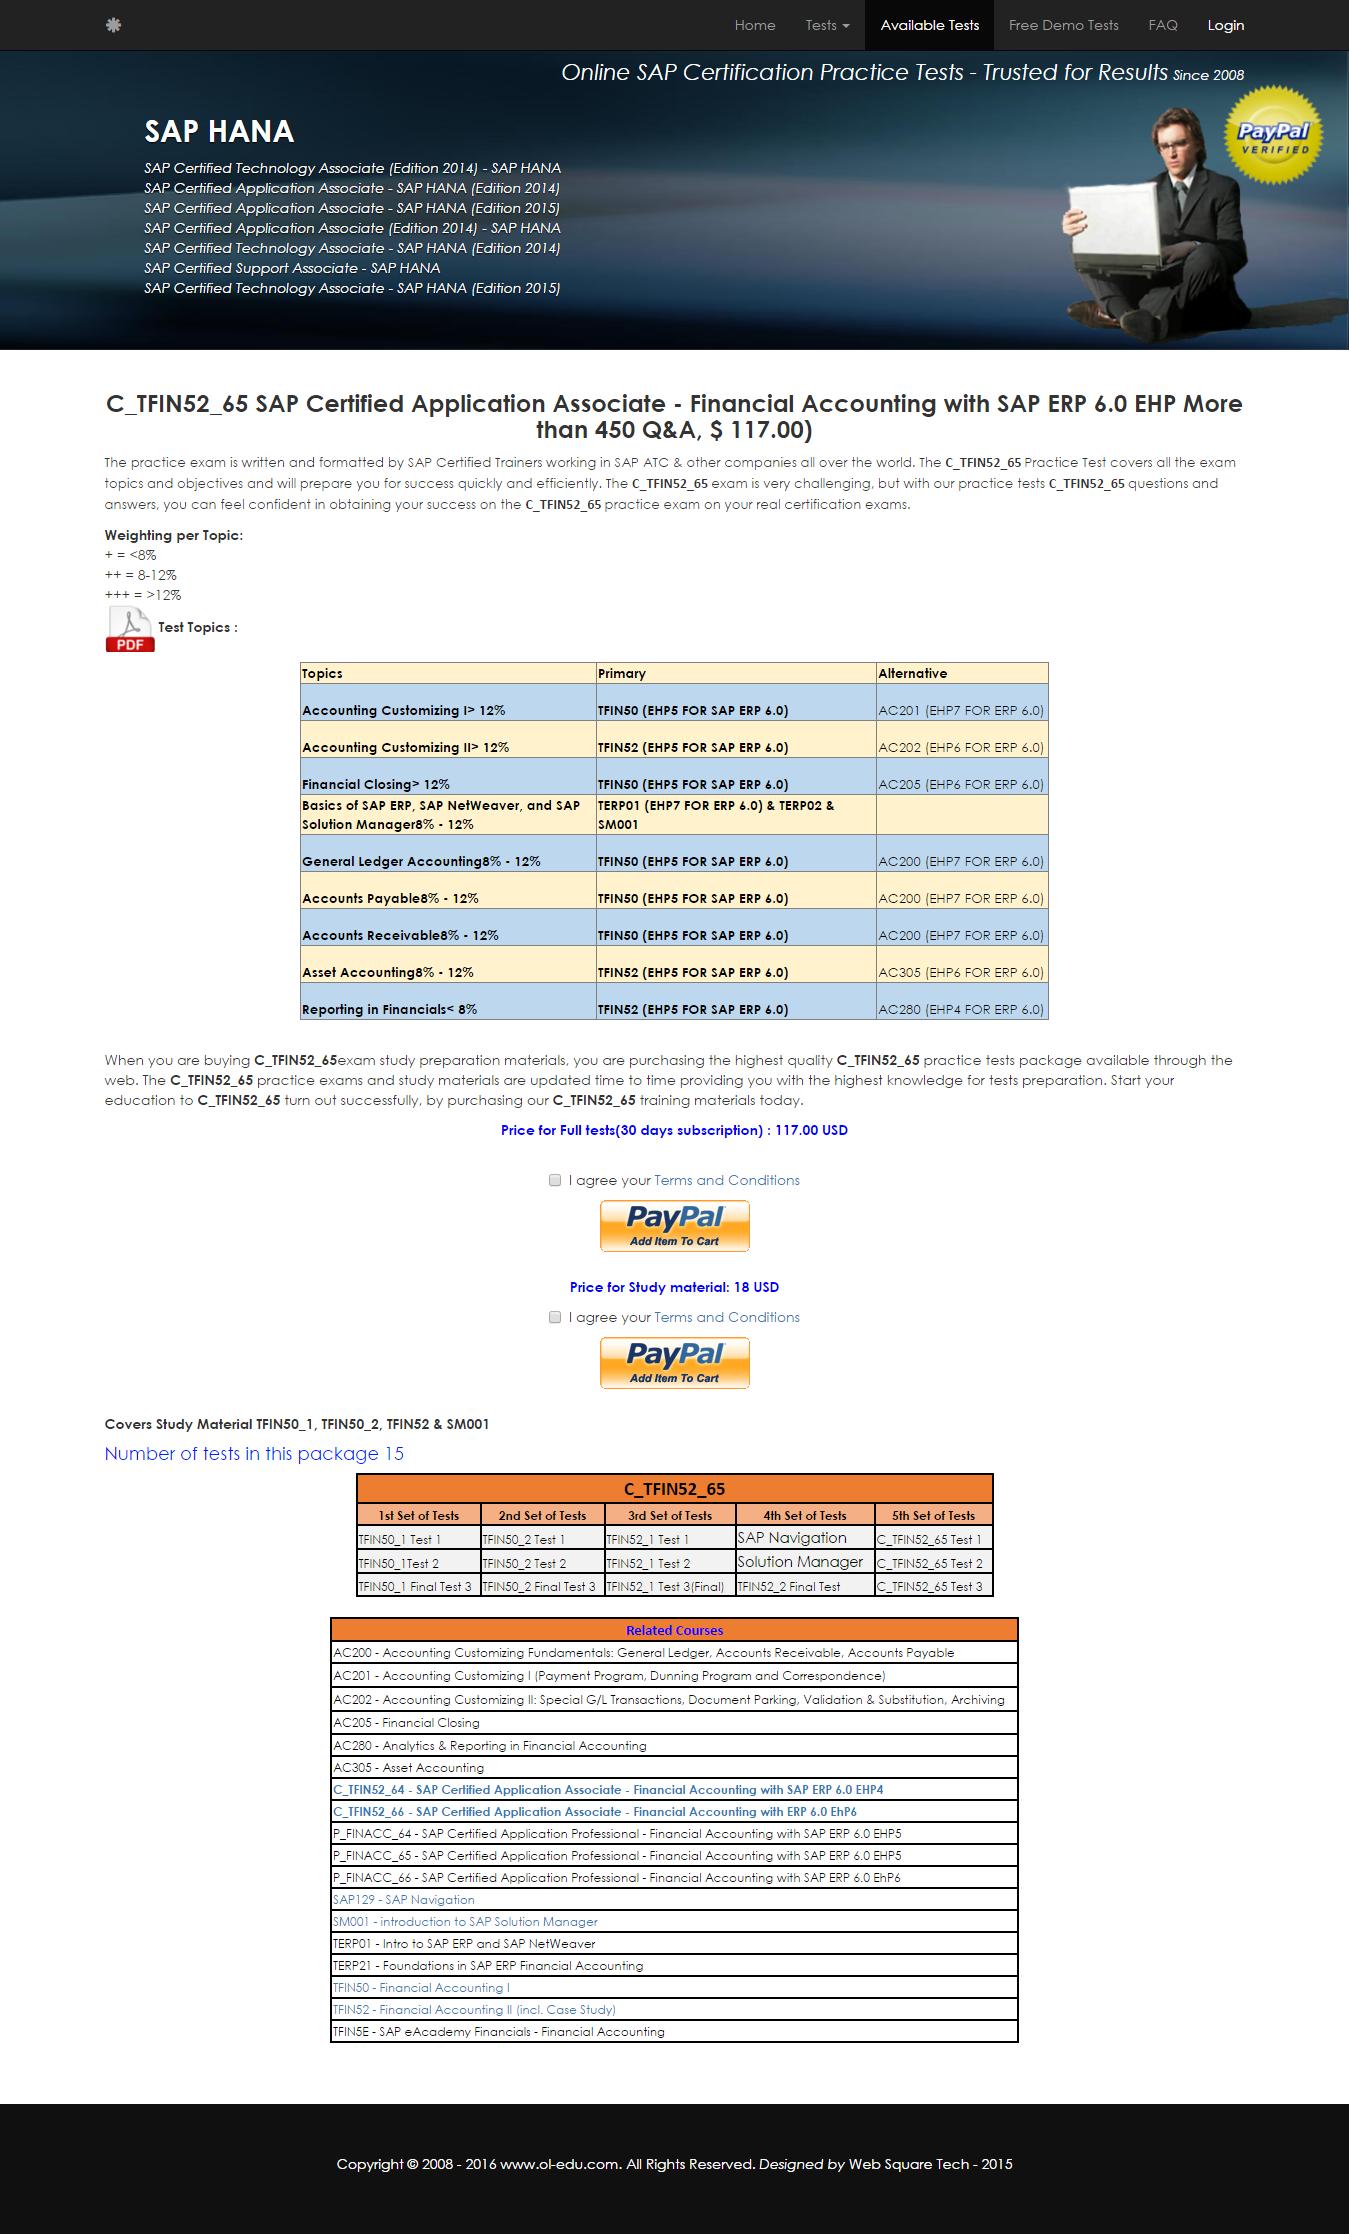 C-TFIN52-65 | C_TFIN52_65 - SAP Certified Application Associate